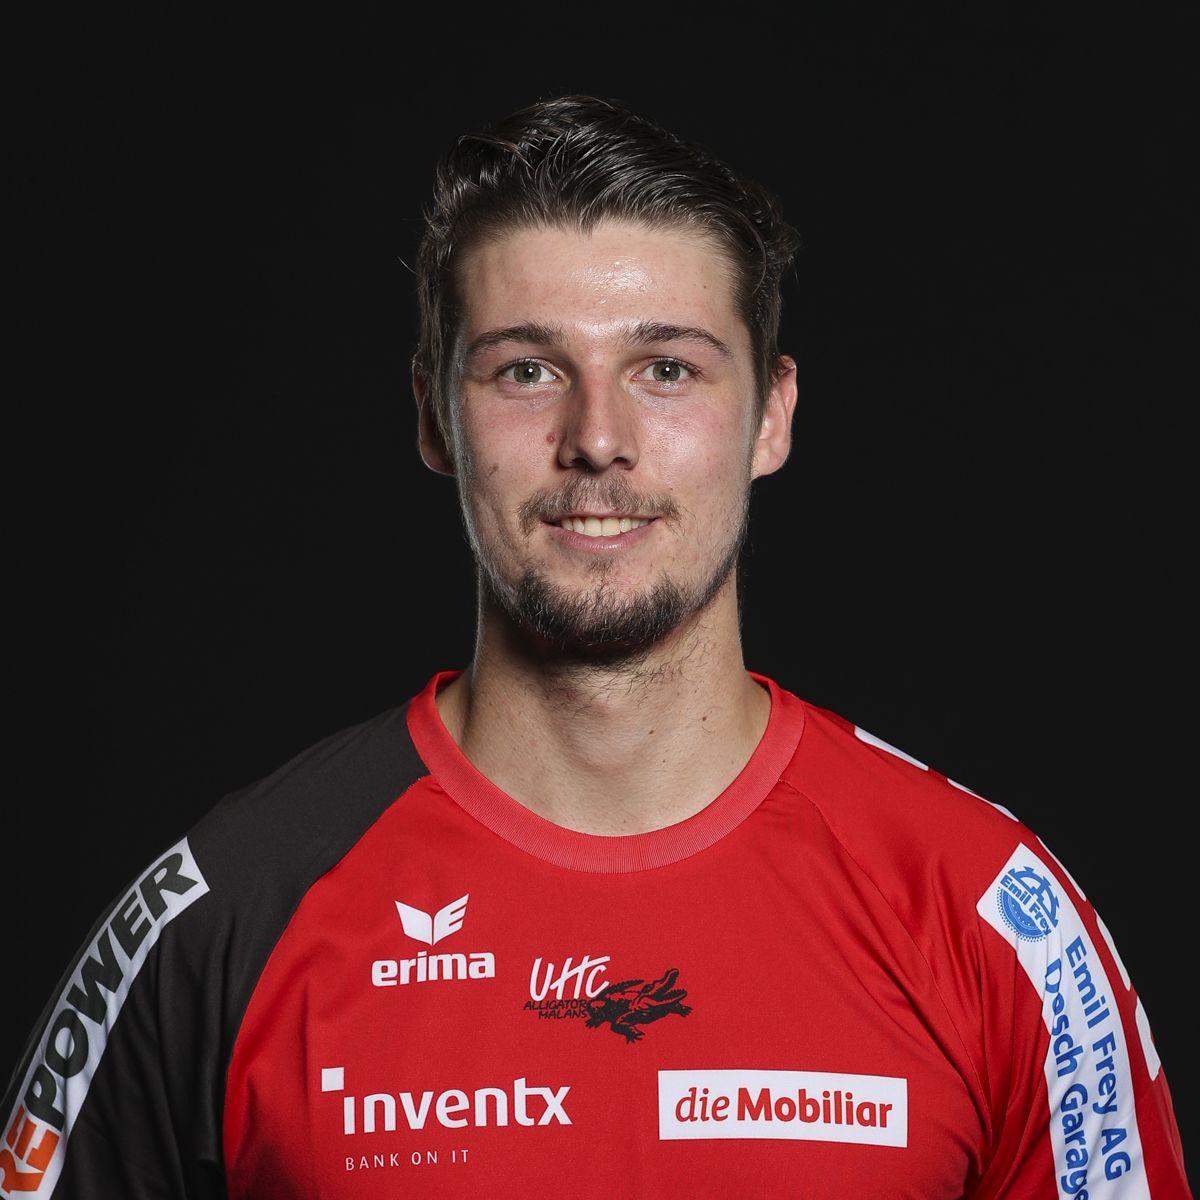 Yannick Vogt #18_NLA_UHC Alligator Malans_Saison 2019-2020_1200x1200_01.jpg